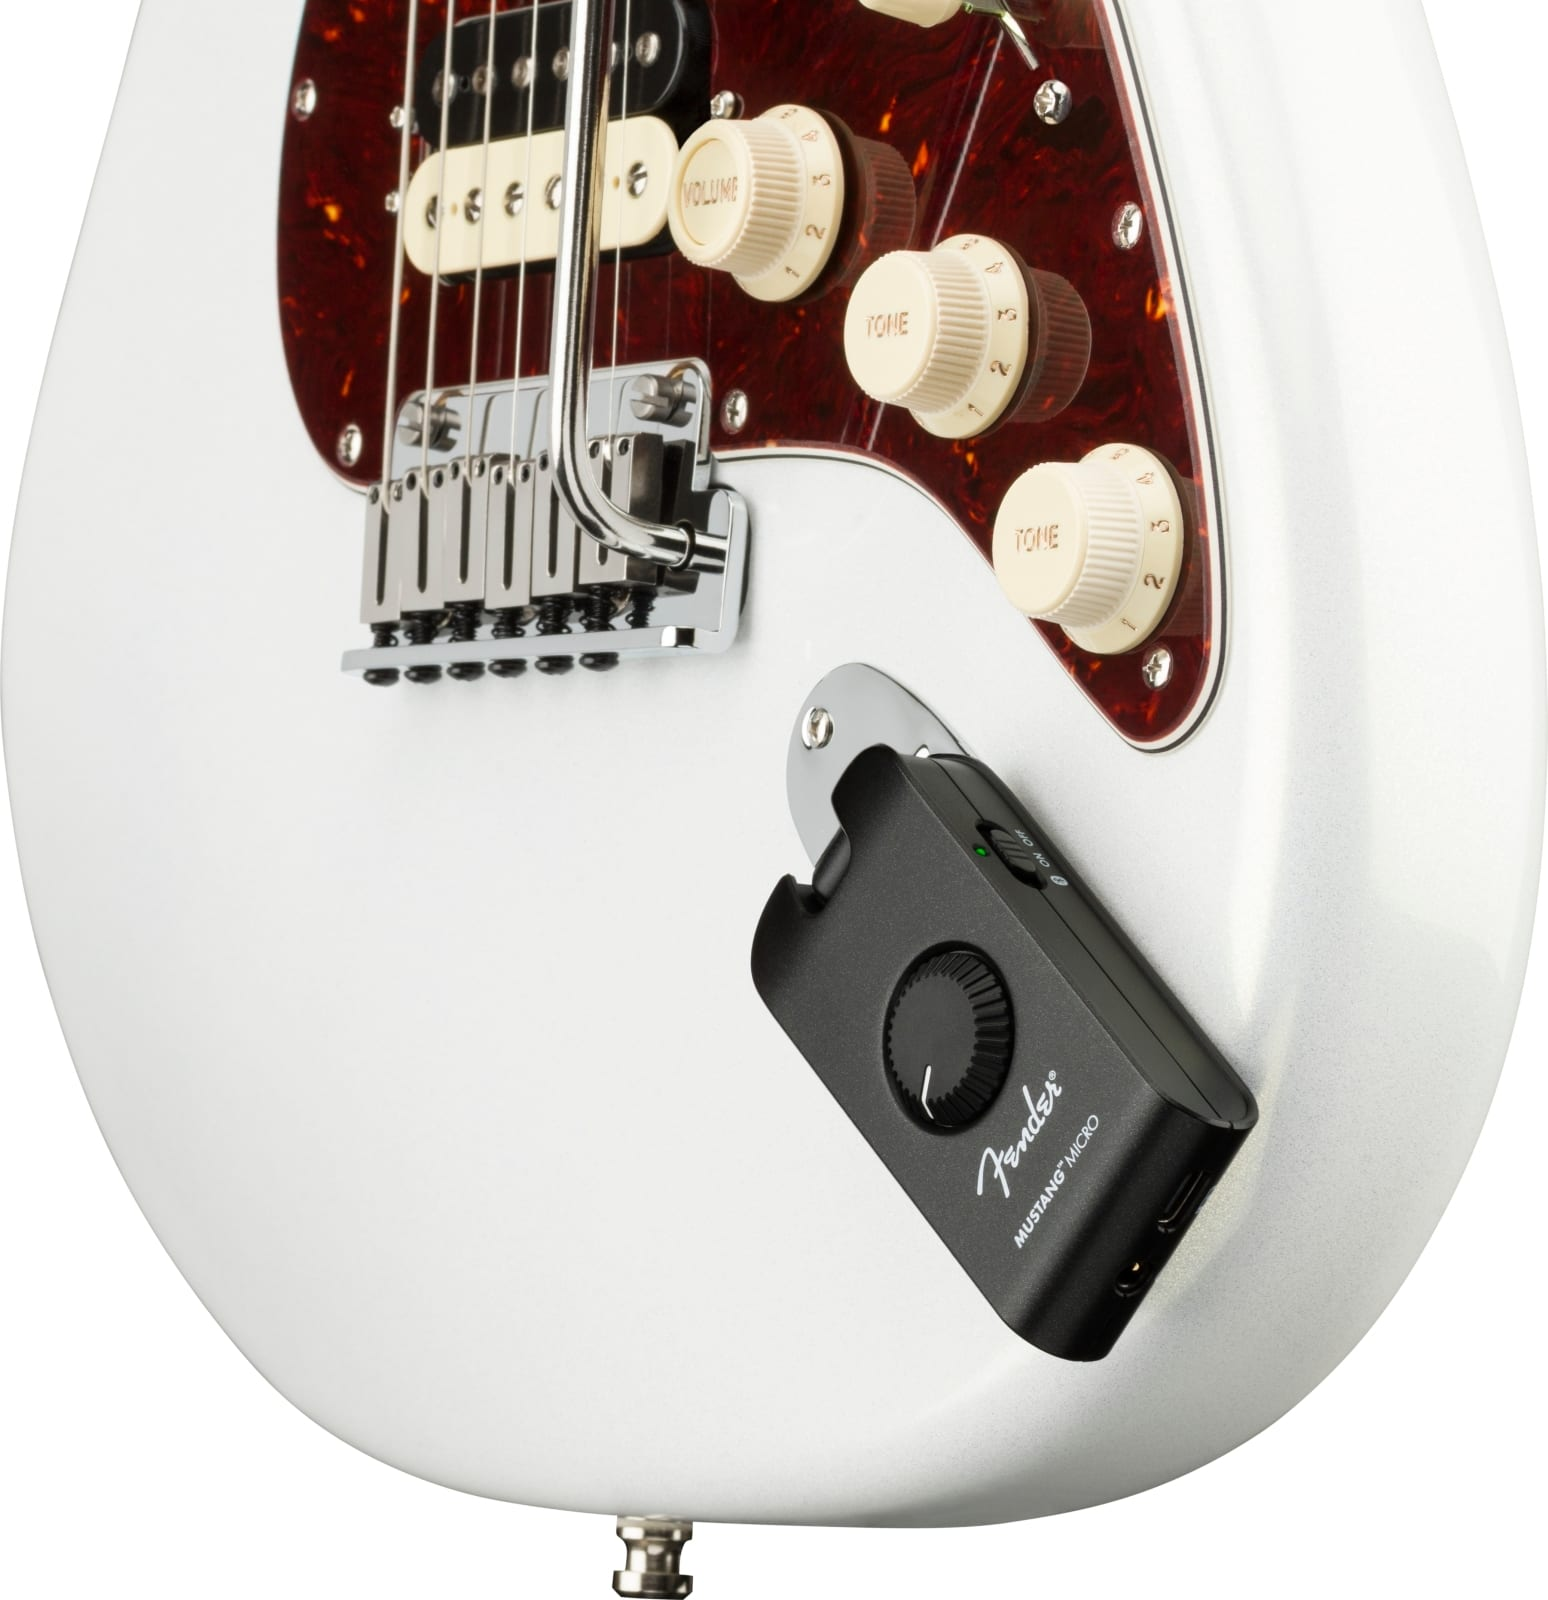 Fender Mustang Micro Headphone Amplifier